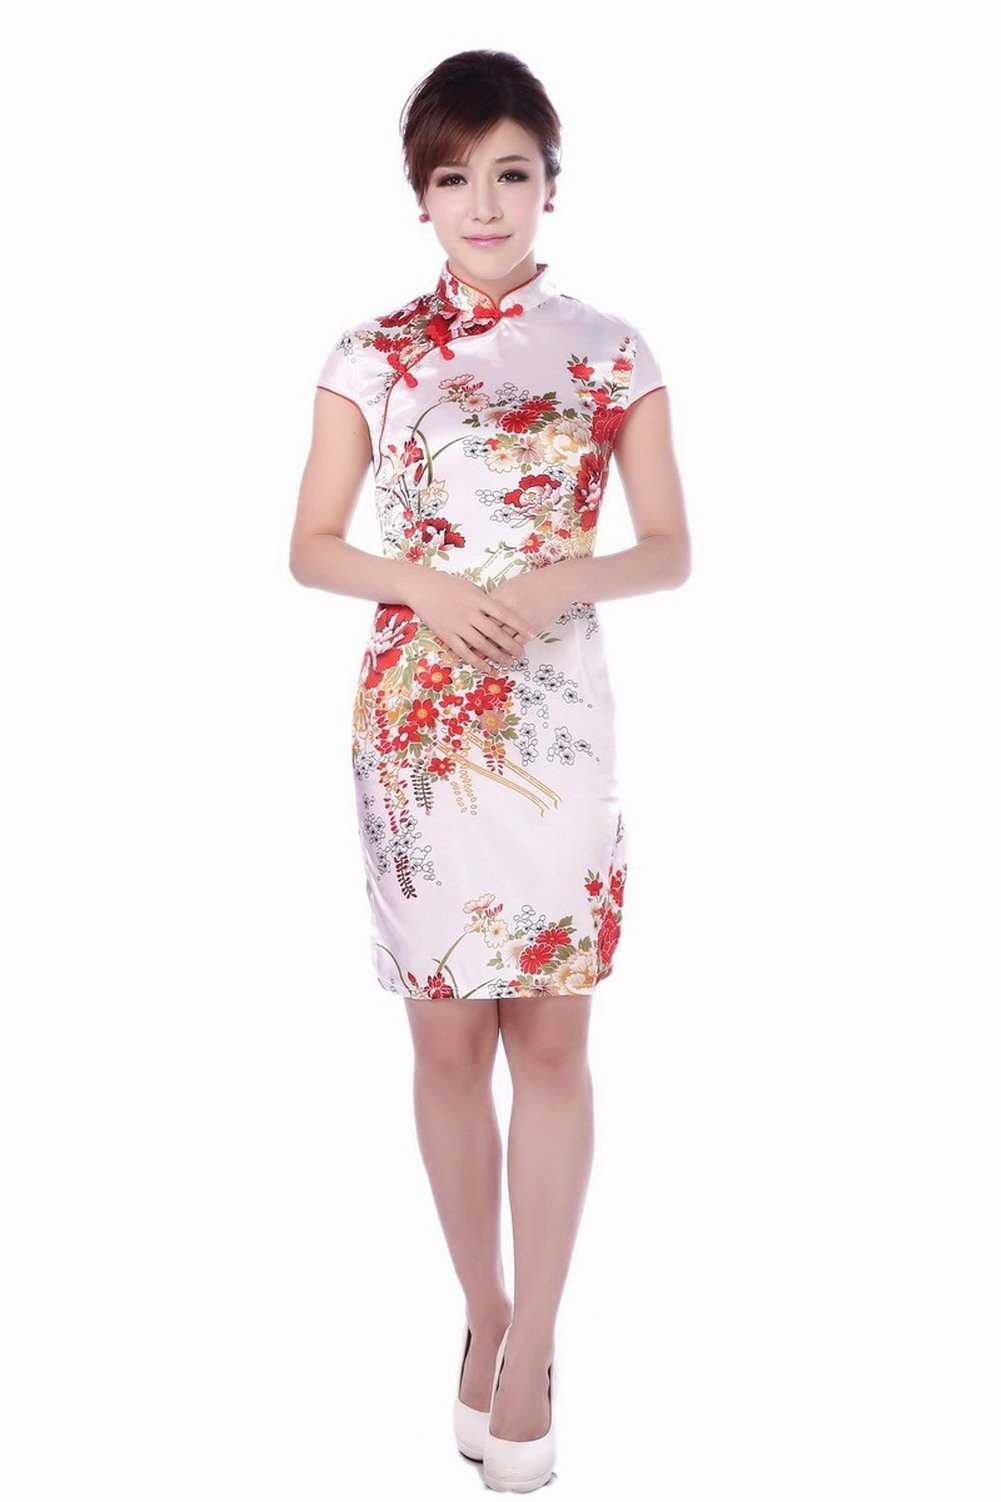 YueLian Women's Chinese Evening Cheongsam Short Qipao Dress (China XL= US 8, White)